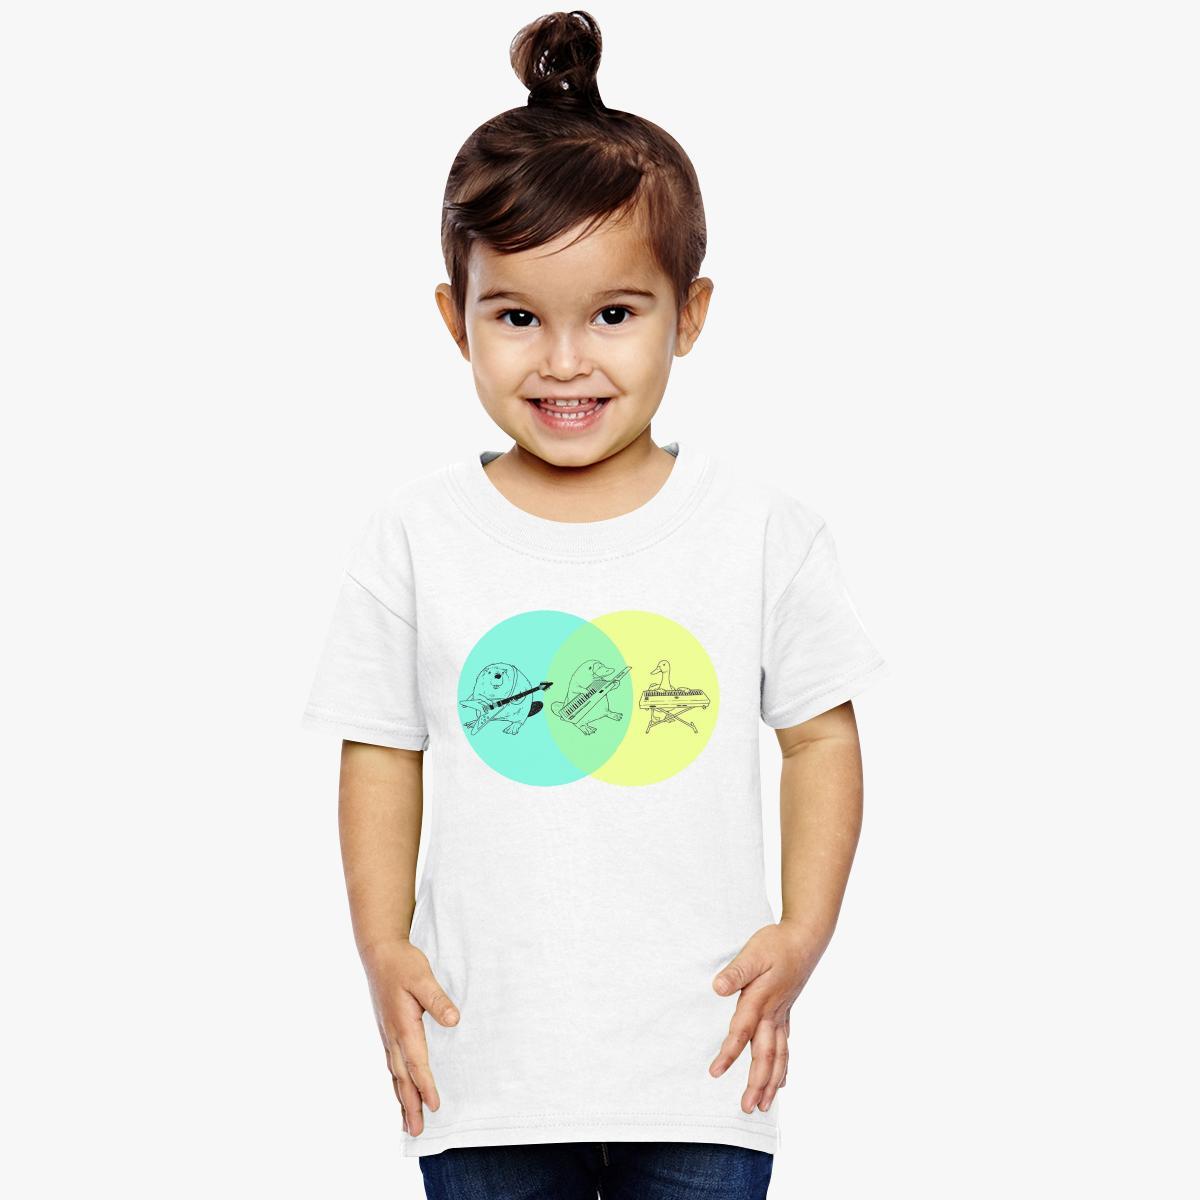 Keytar platypus venn diagram toddler t shirt customon keytar platypus venn diagram toddler t shirt pooptronica